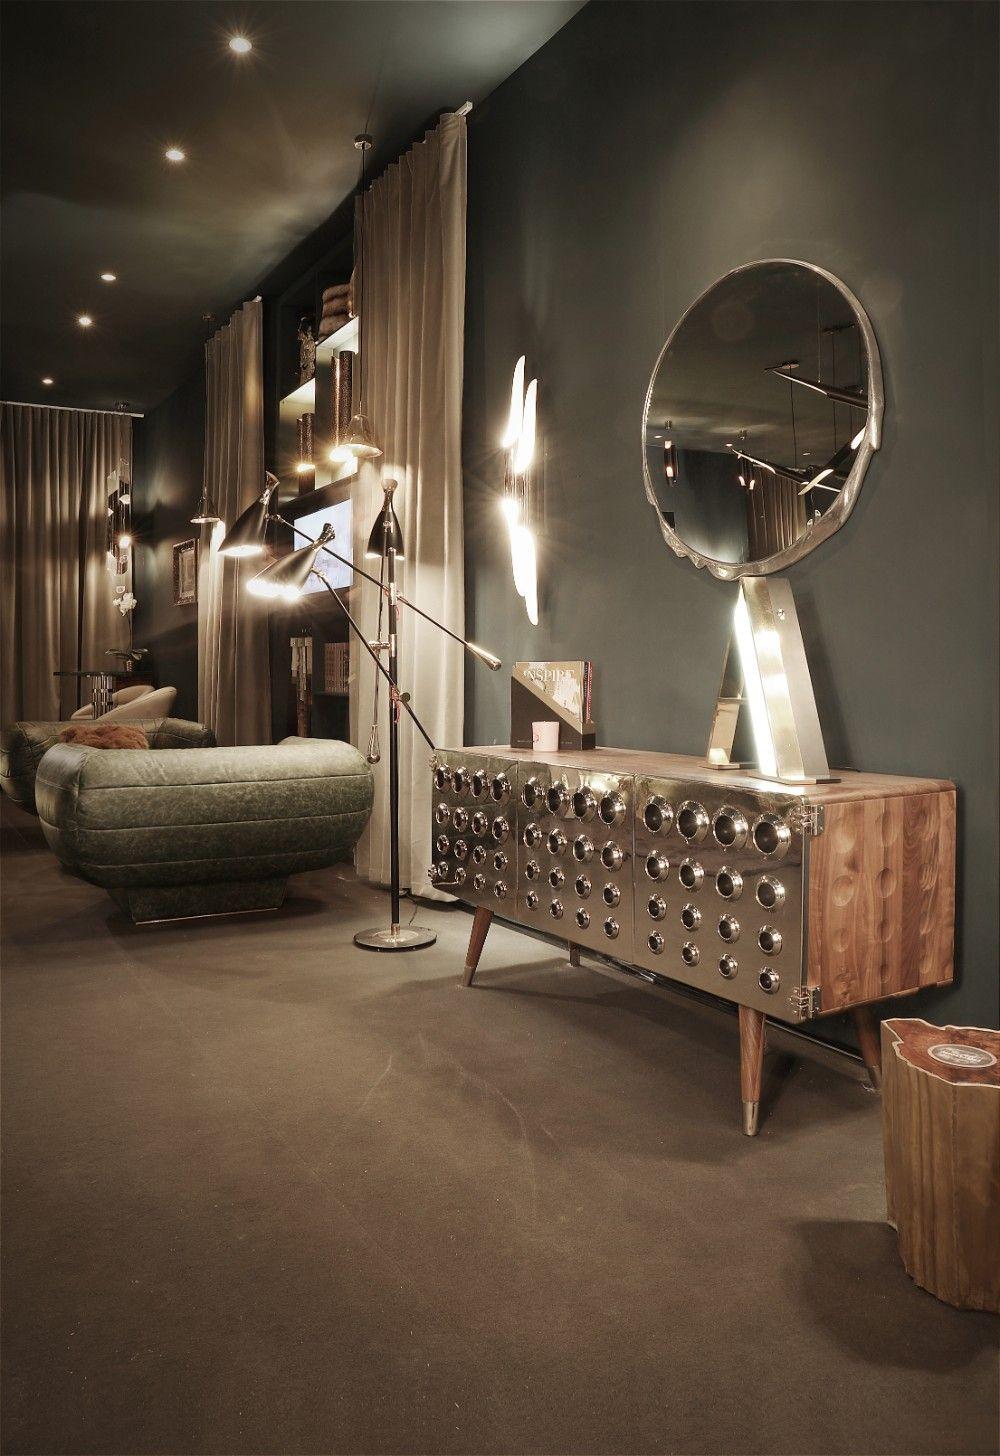 @covethouse_ at @isaloni   Salone del Mobile 2017   iSaloni 2017 #salonedelmobile #isaloni #interiordesign Find more at: http://www.covethouse.eu/ISALONI-2017/